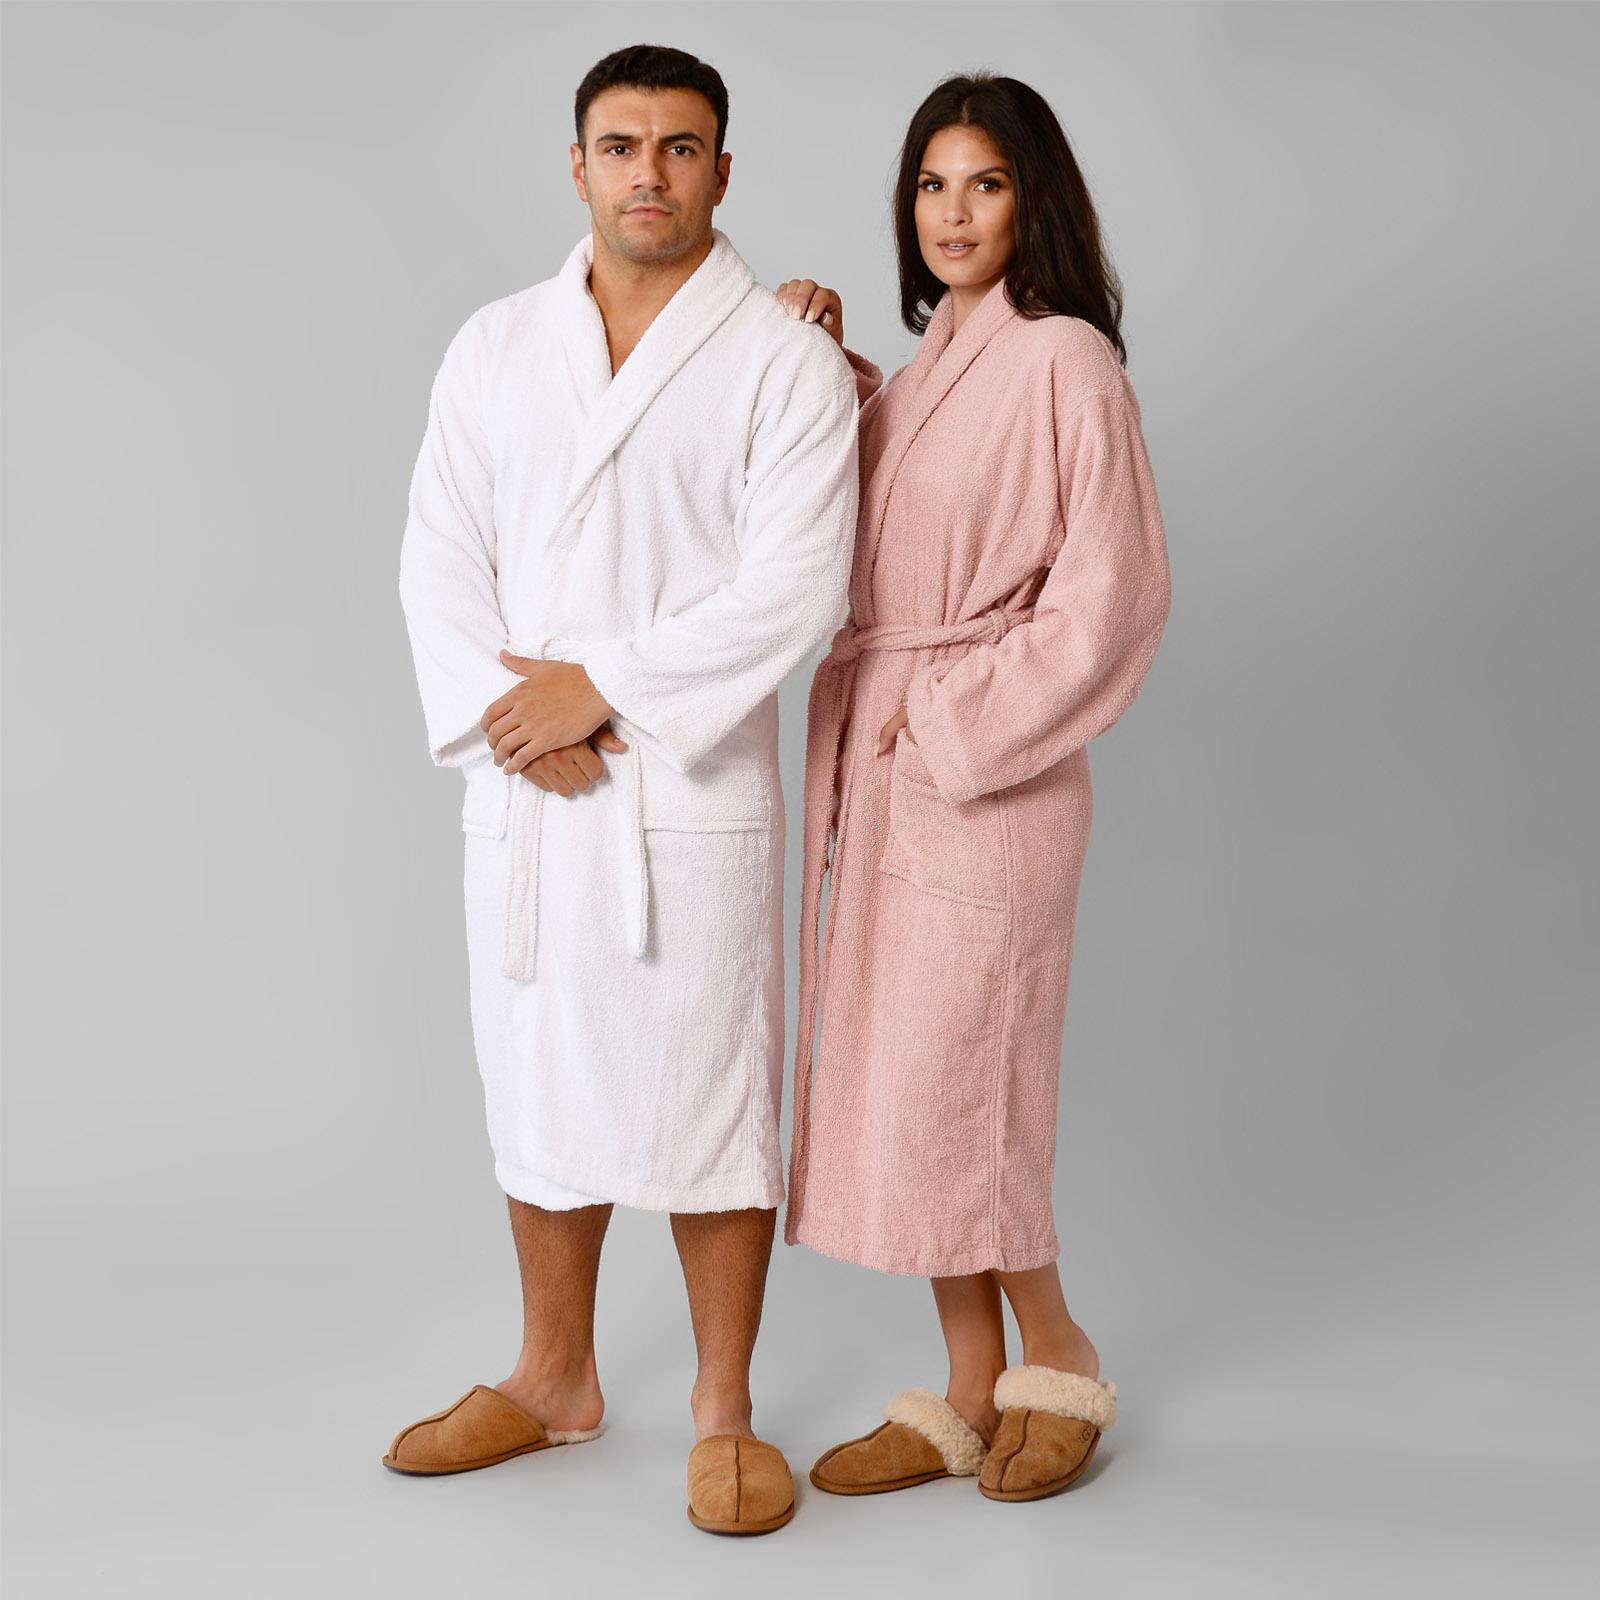 thumbnail 20 - Brentfords Luxury 100% Cotton Bath Robe Terry Towel Soft Dressing Gown Unisex